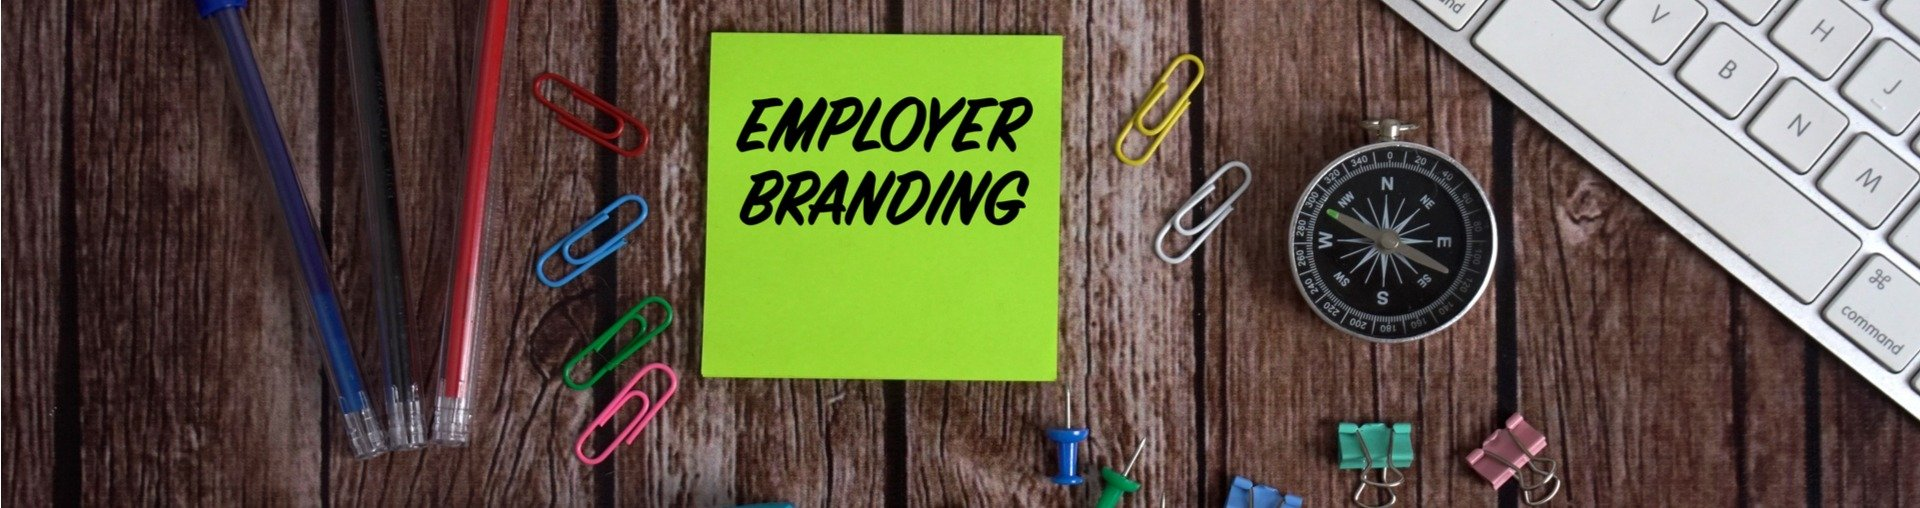 brandul de angajator